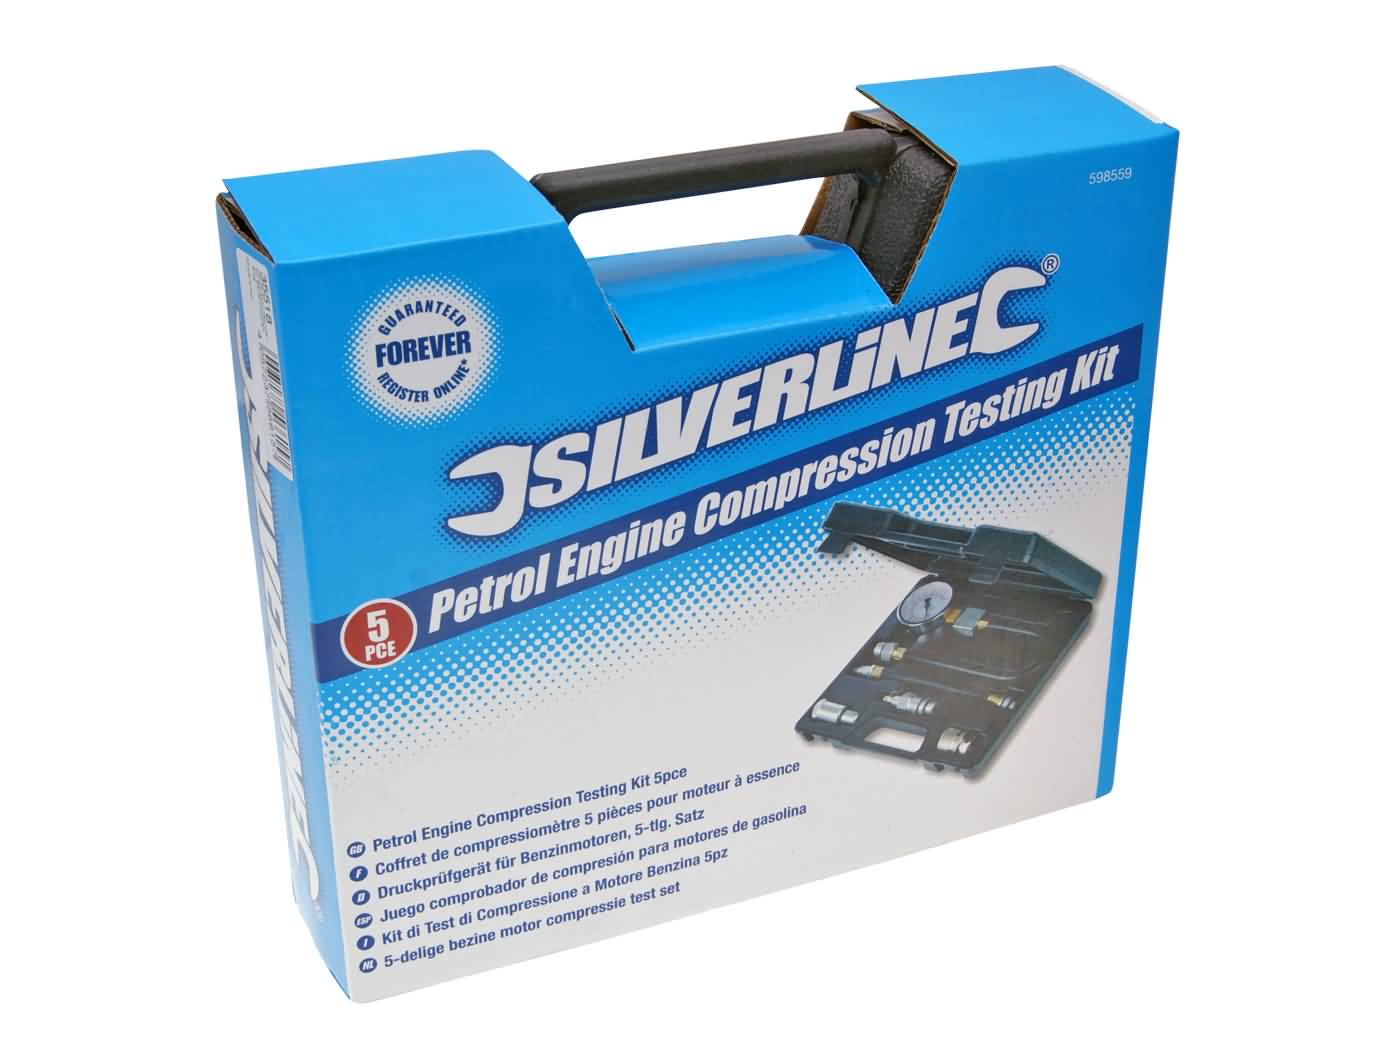 5-Piece Silverline 598559 Petrol Engine Compression Testing Kit